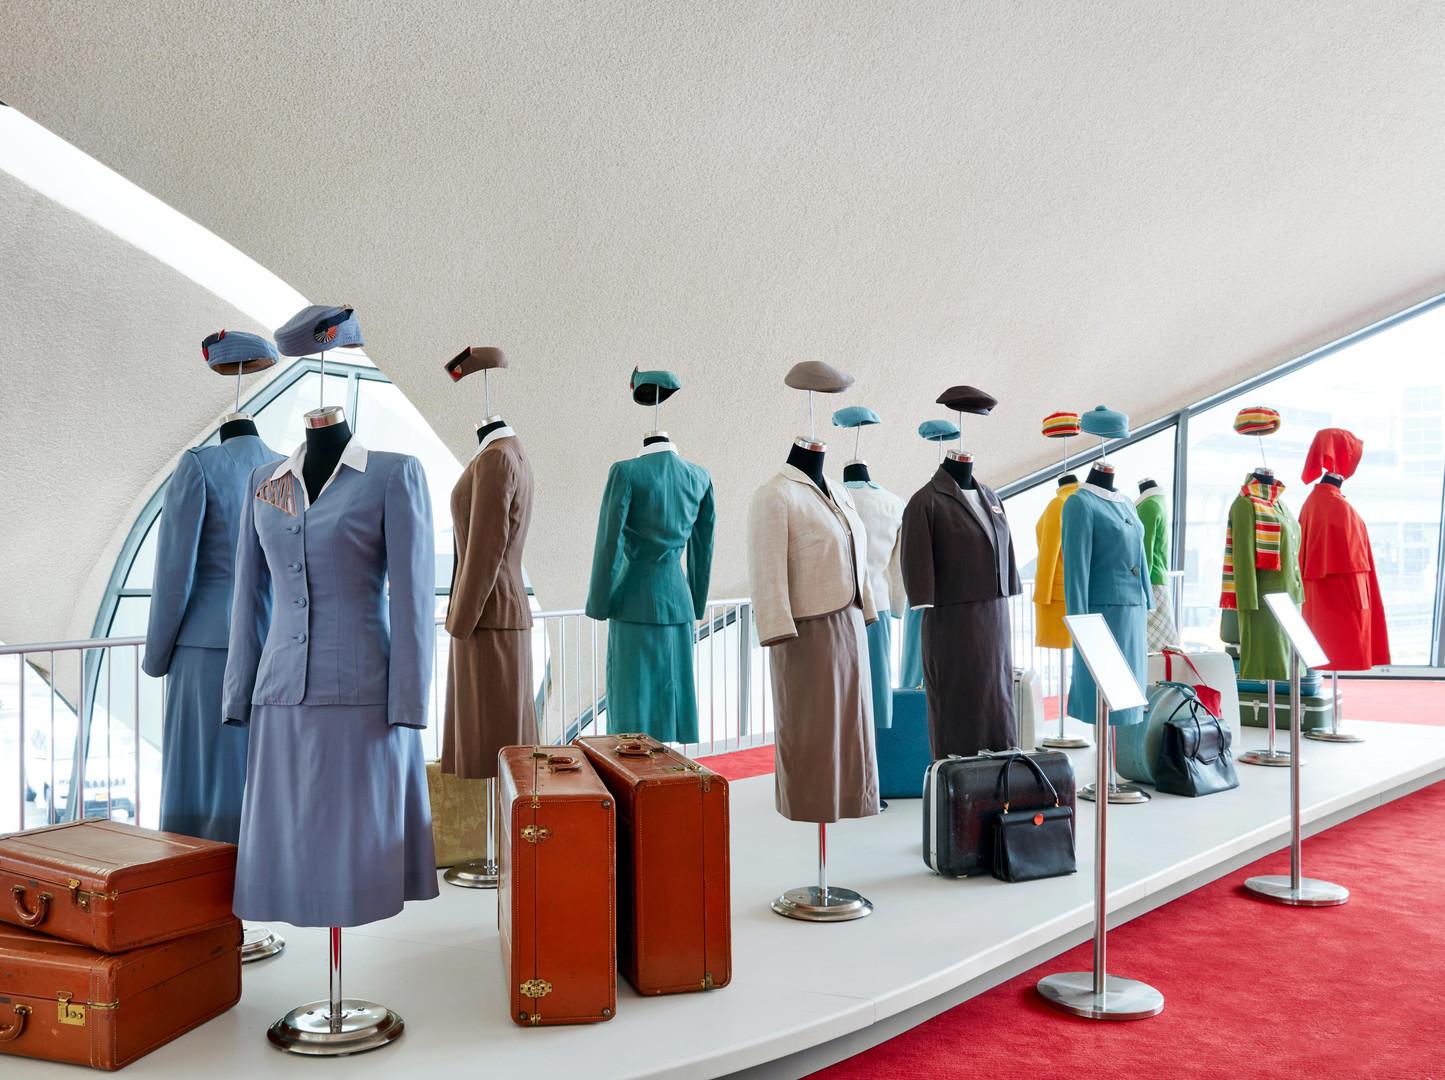 TWA Hotel's Many Museum Exhibits